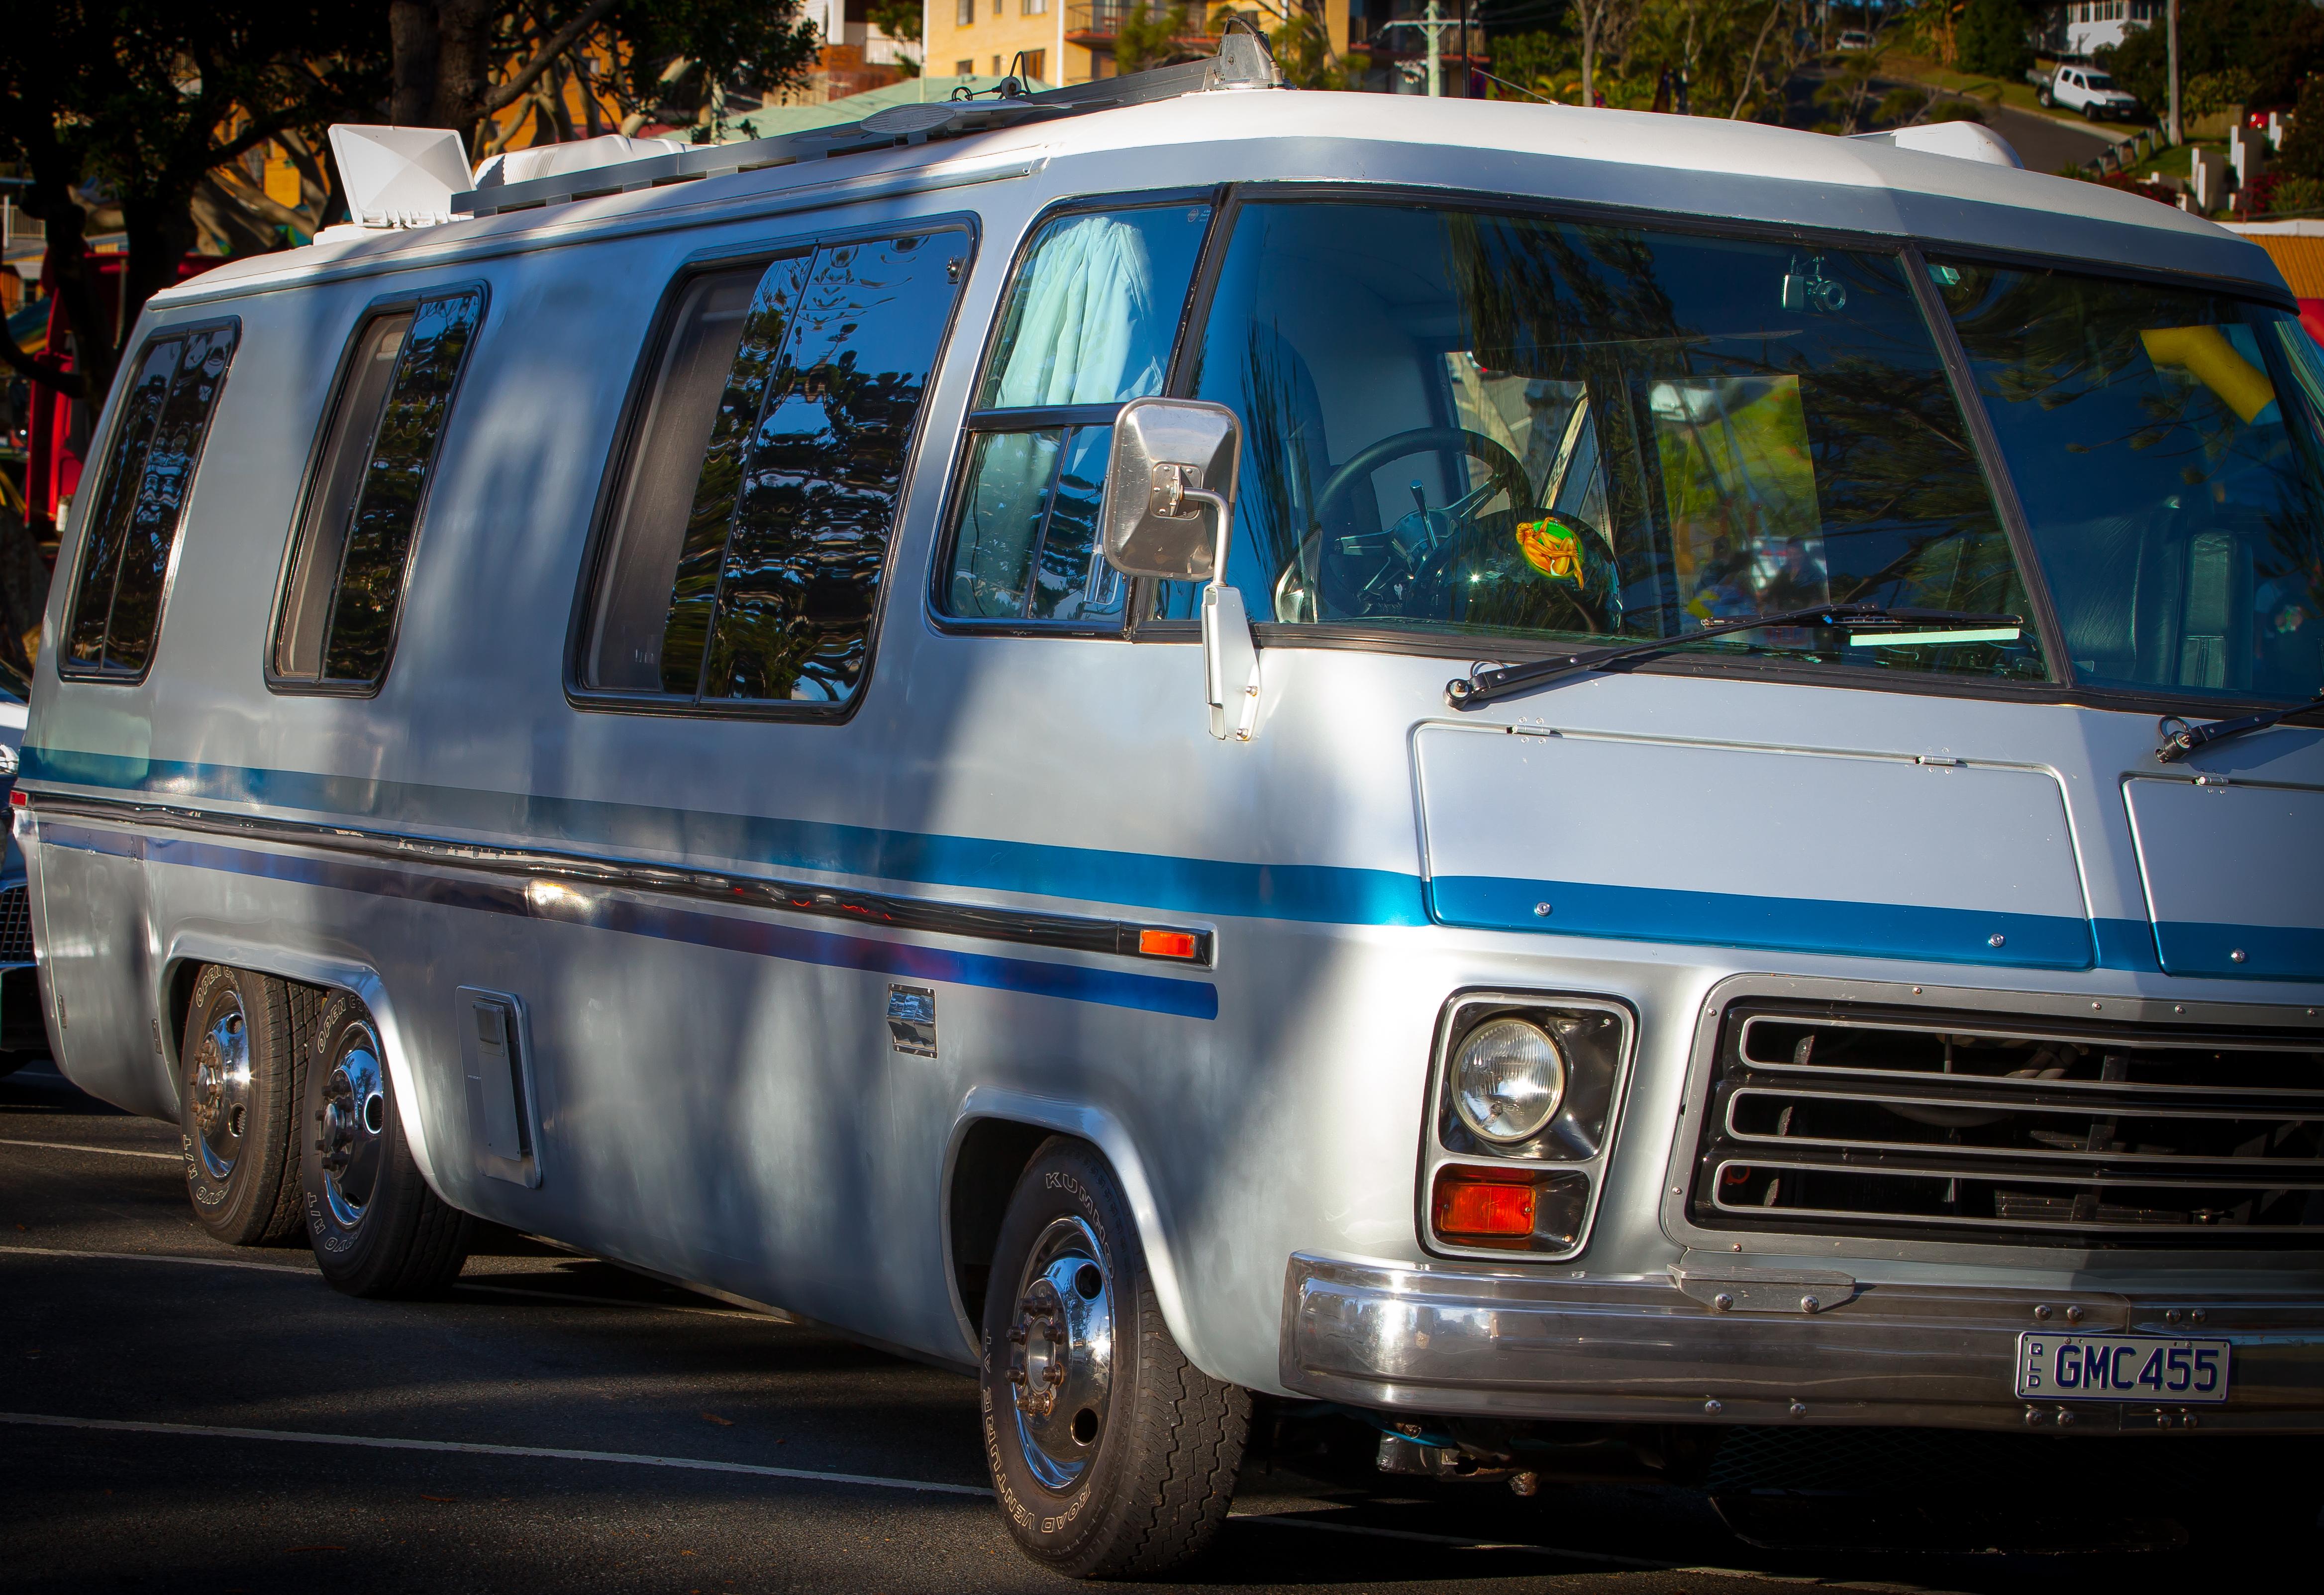 1978 GMC Royale Motorhome – Star Cars Agency